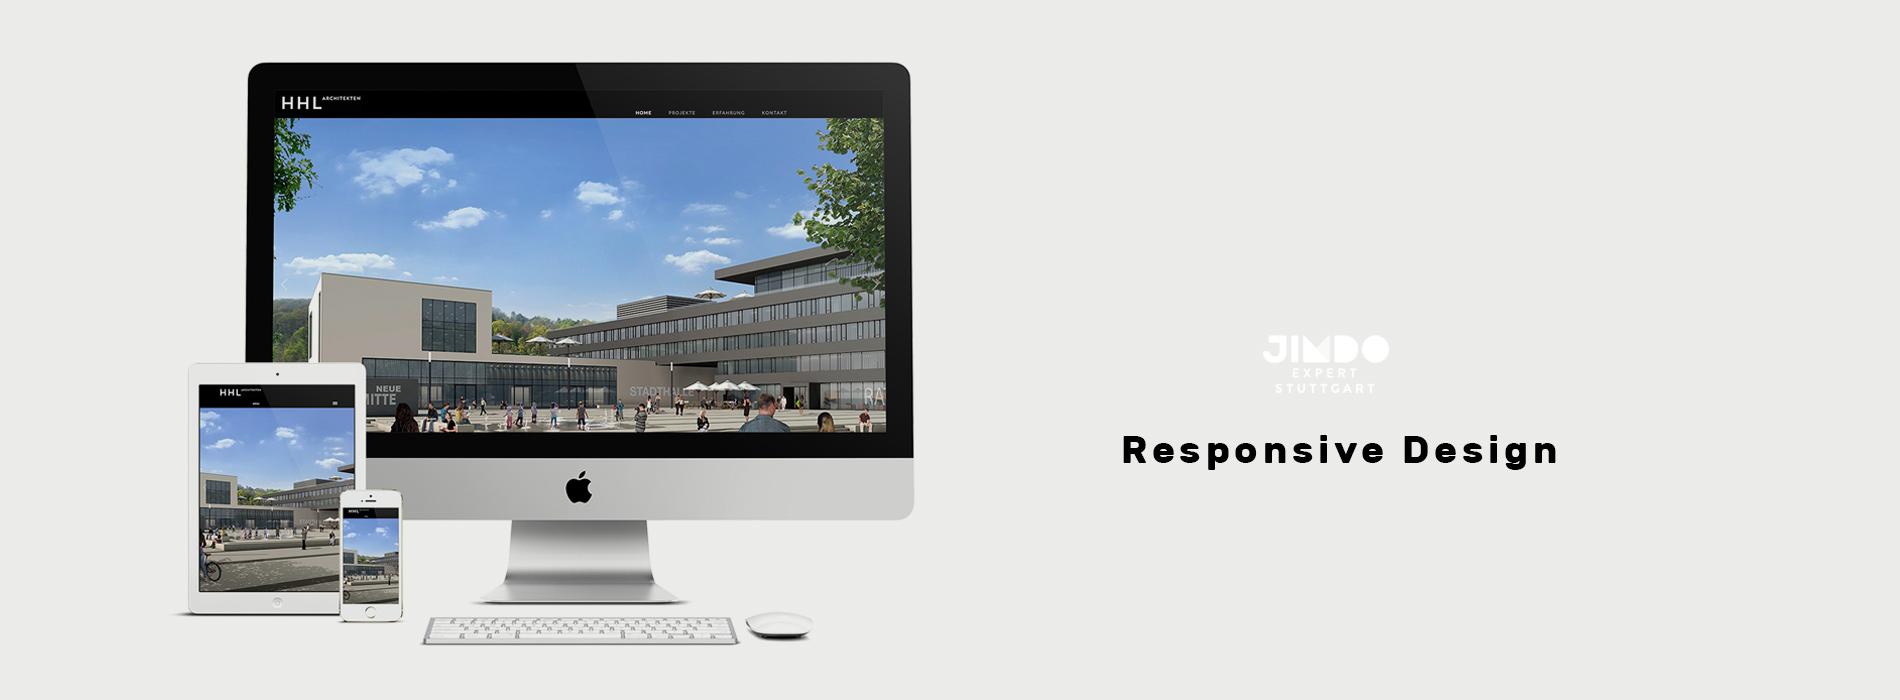 Jimdo Expert Stuttgart - Responsive Design, Responsive Webdesign - Peter Scheerer